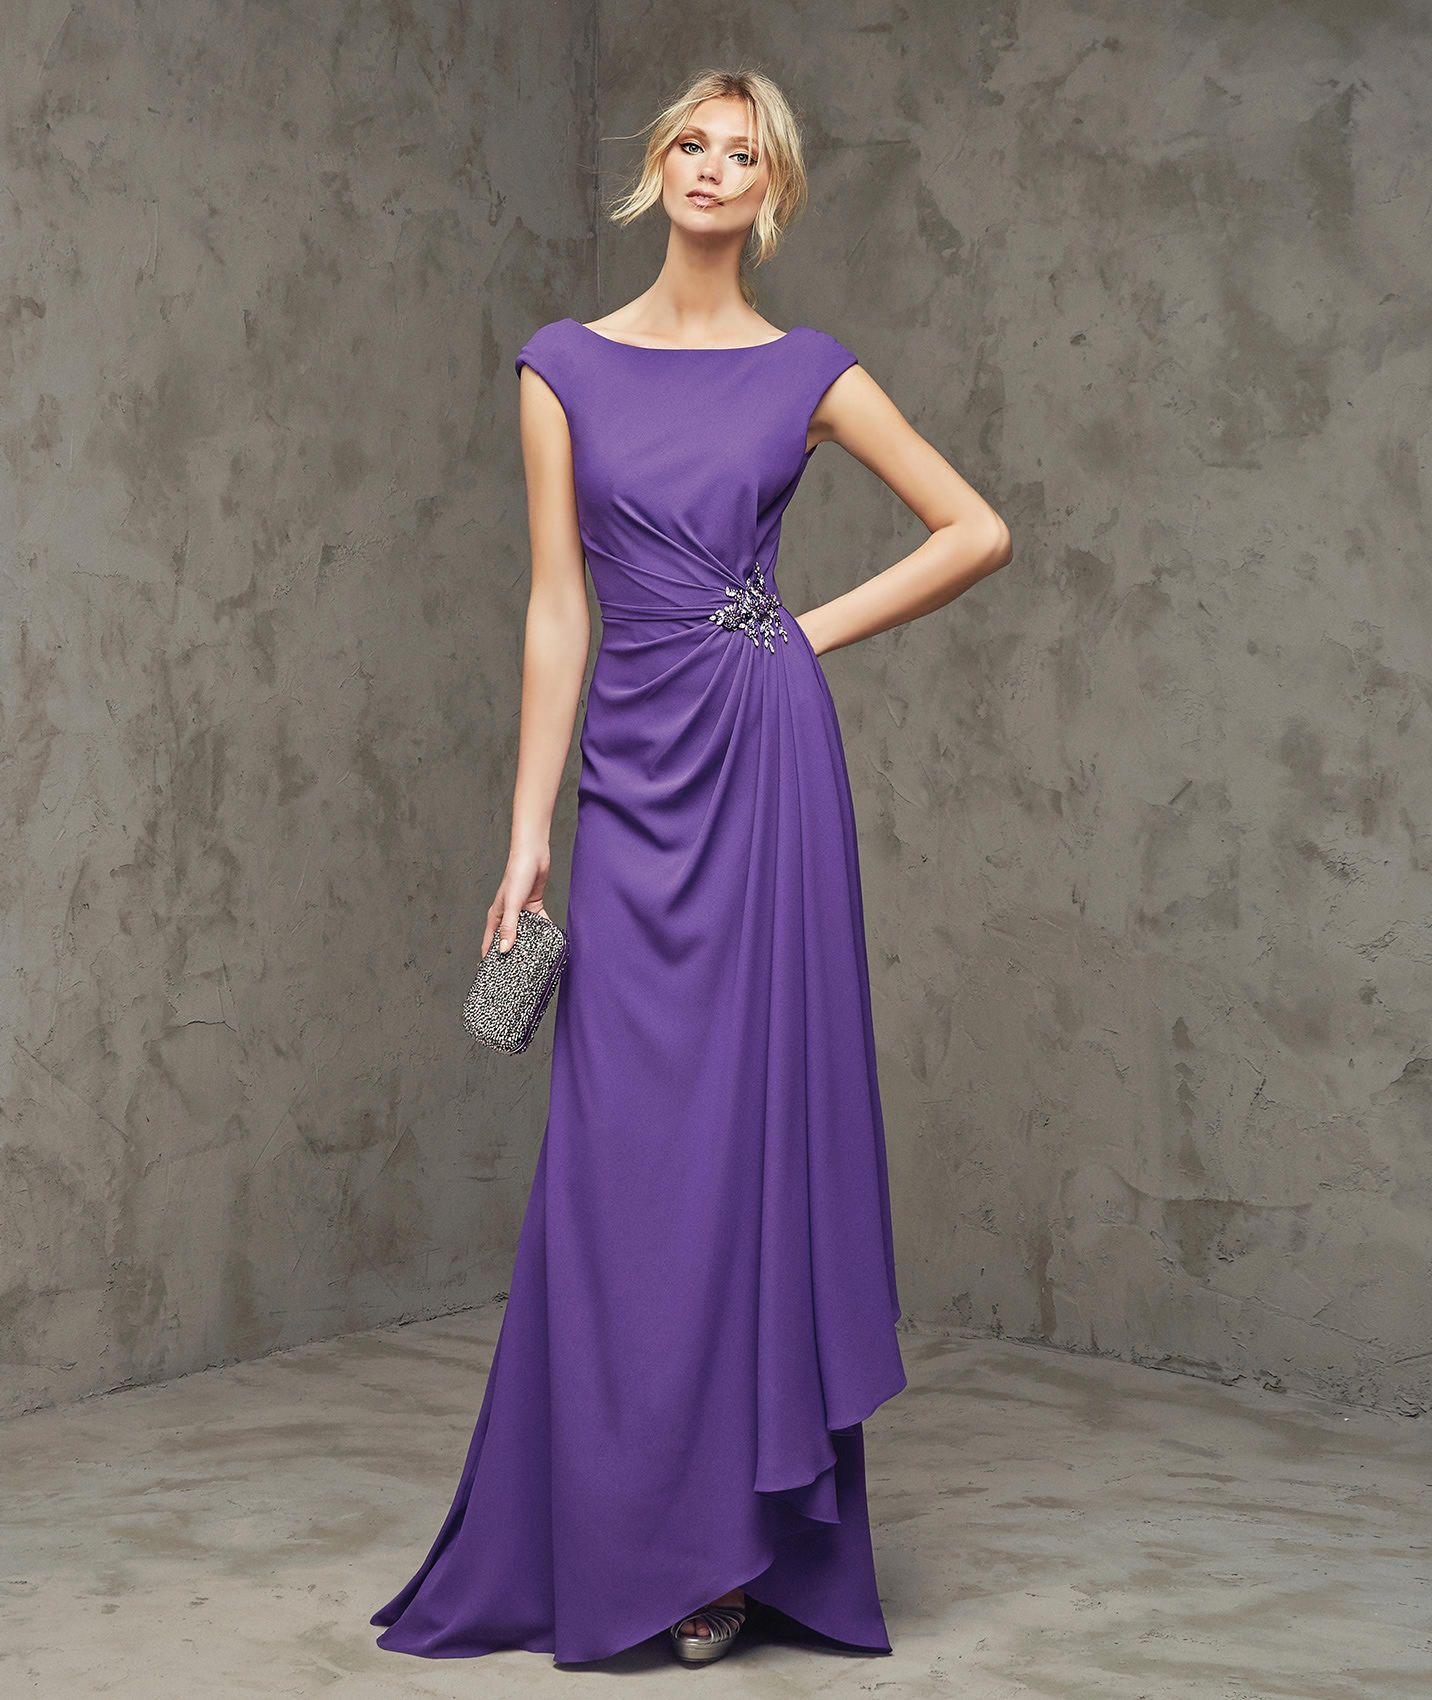 Fabiana, Long cocktail dress, bateau neckline | My Style | Pinterest ...